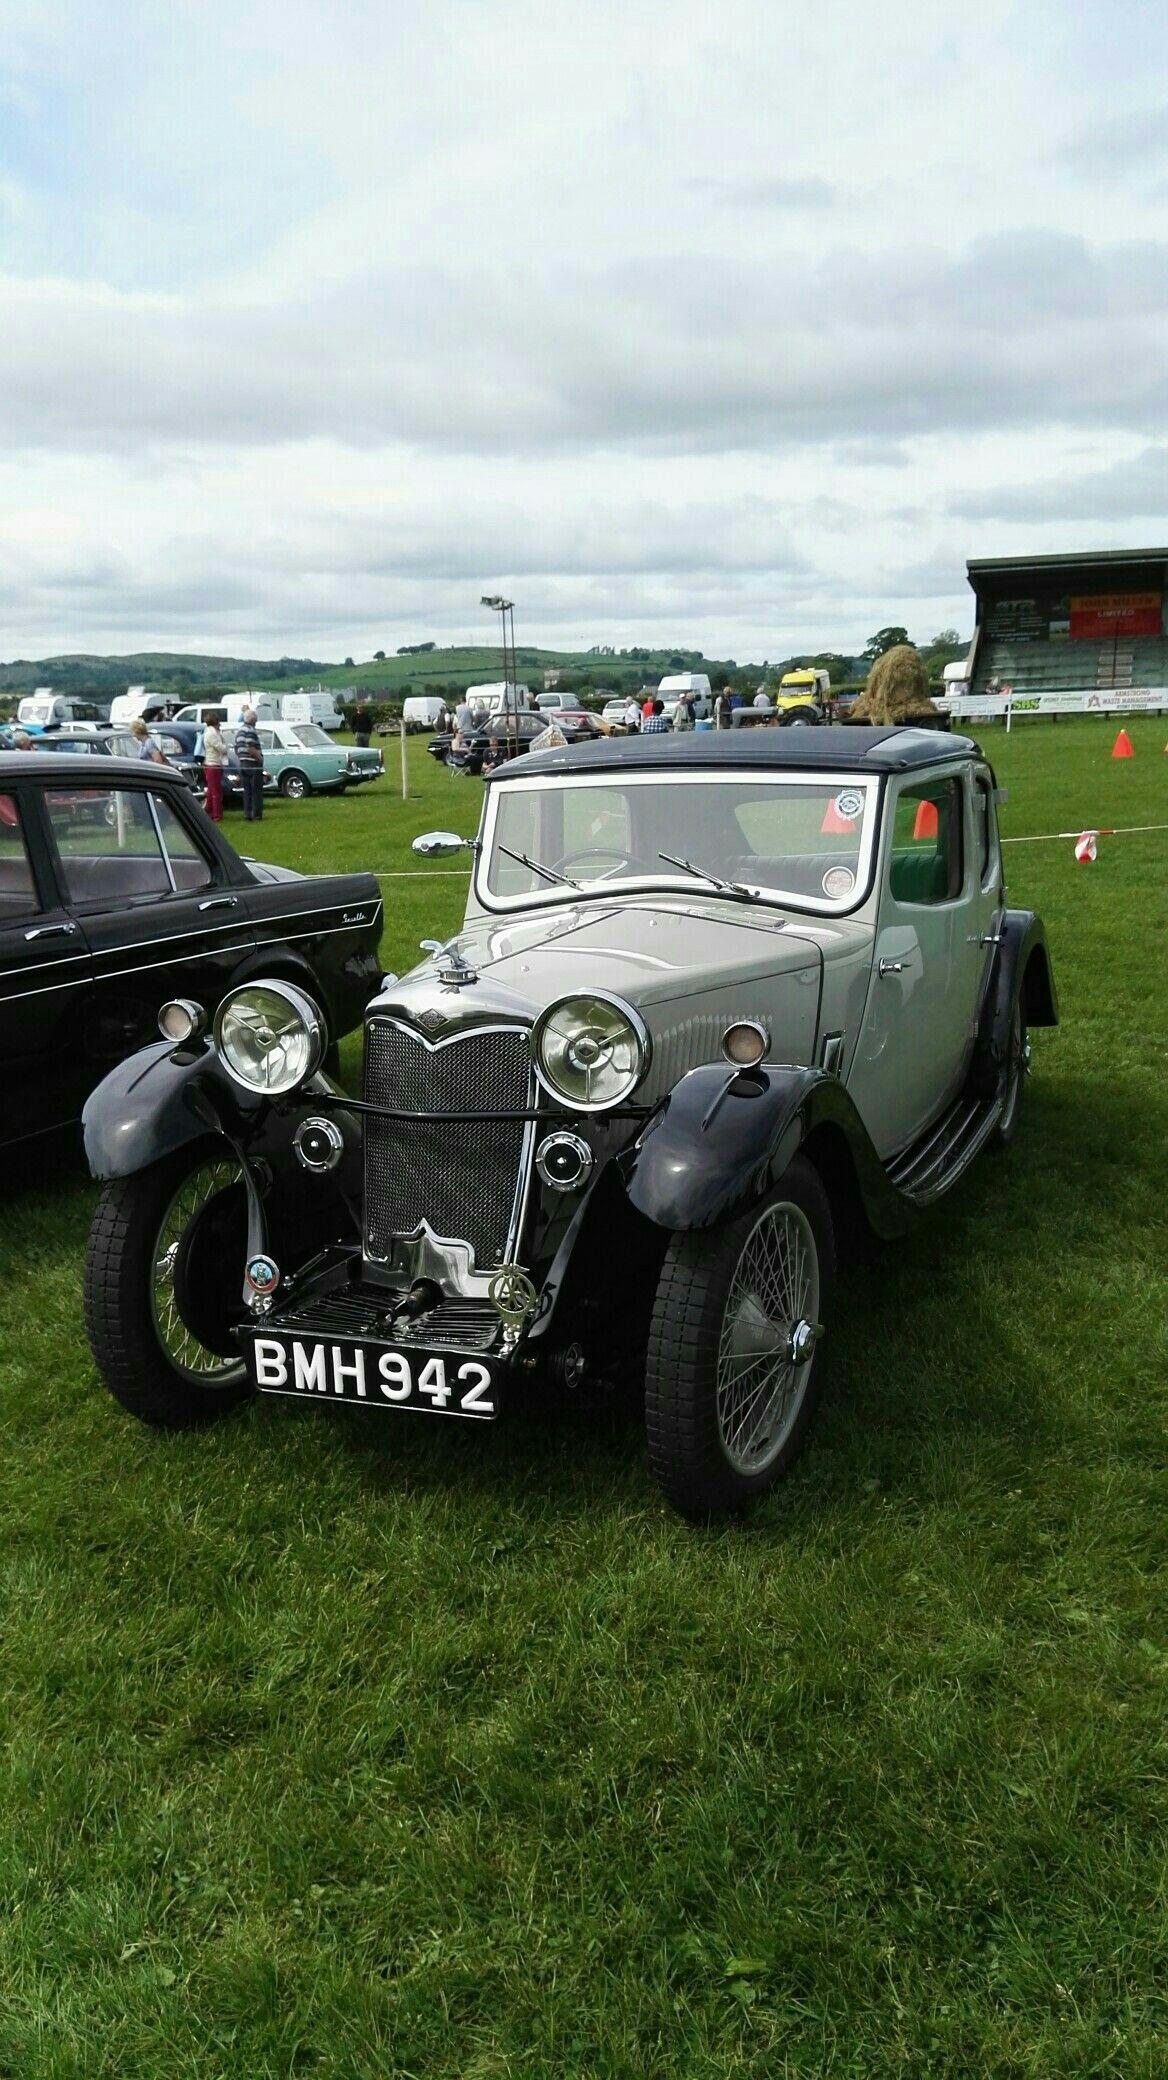 BMH 942 1934 Riley kestrel all original at Dumfries vintage rally ...